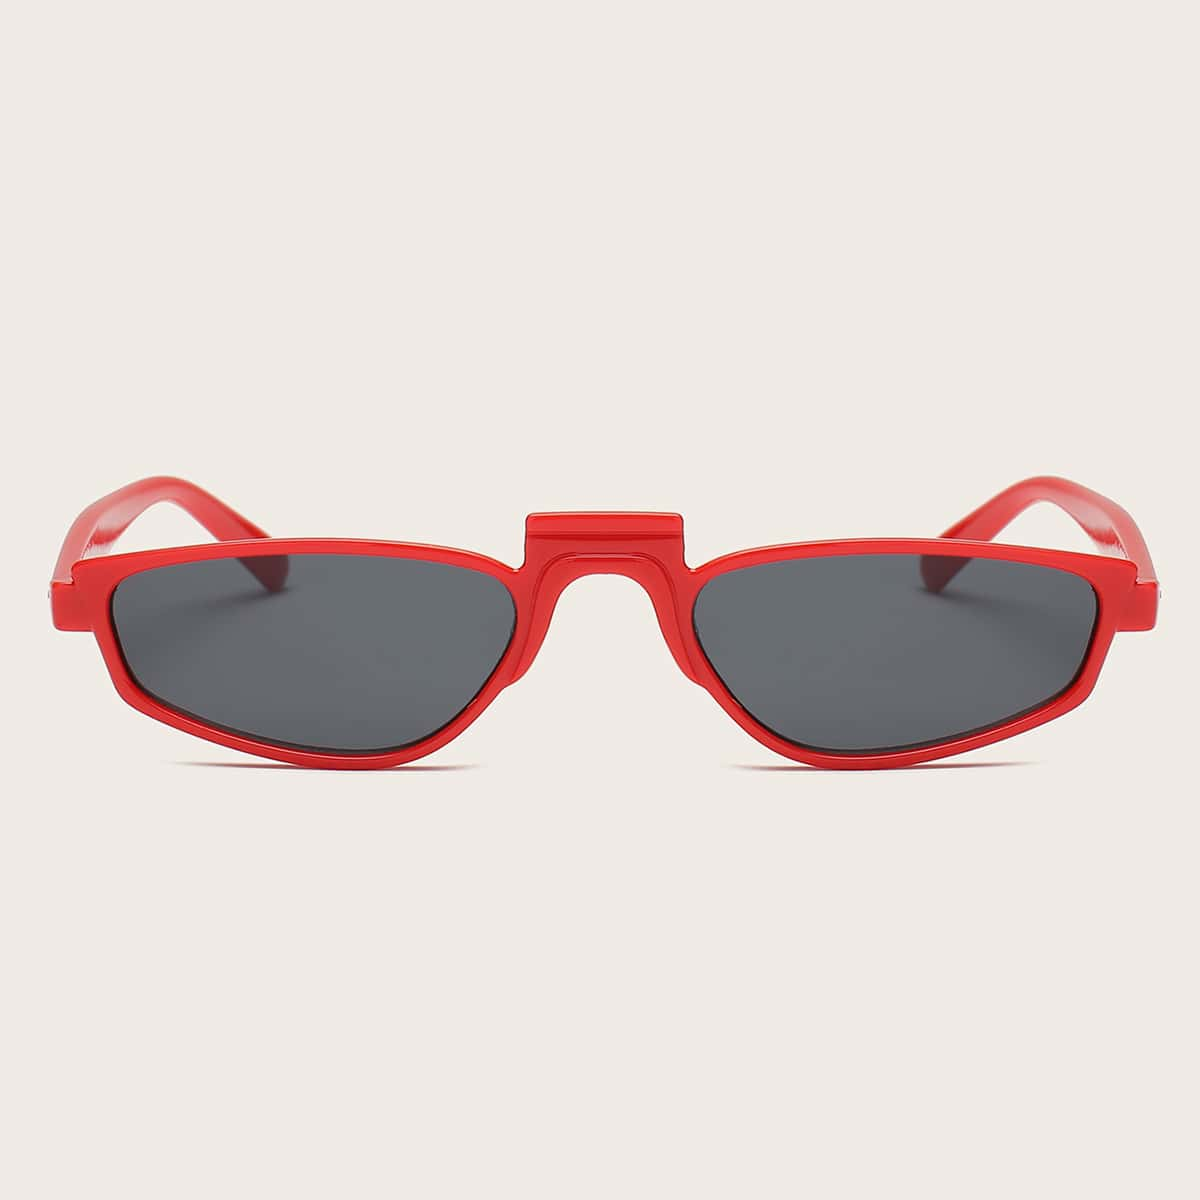 Acrylic Irregular Frame Sunglasses